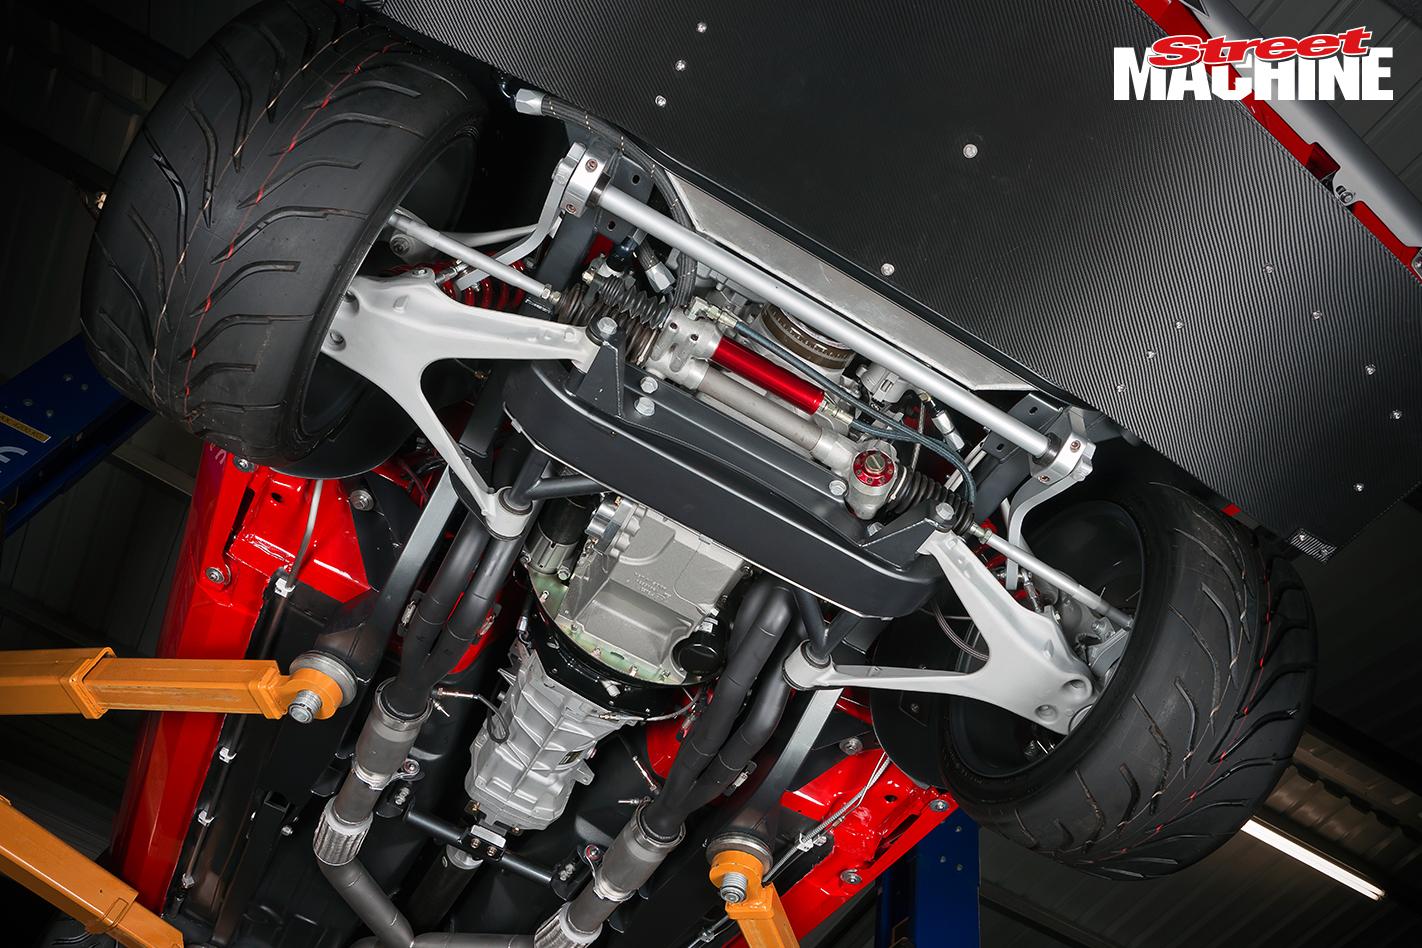 69 Camaro Pro Touring LSX 9 Nw